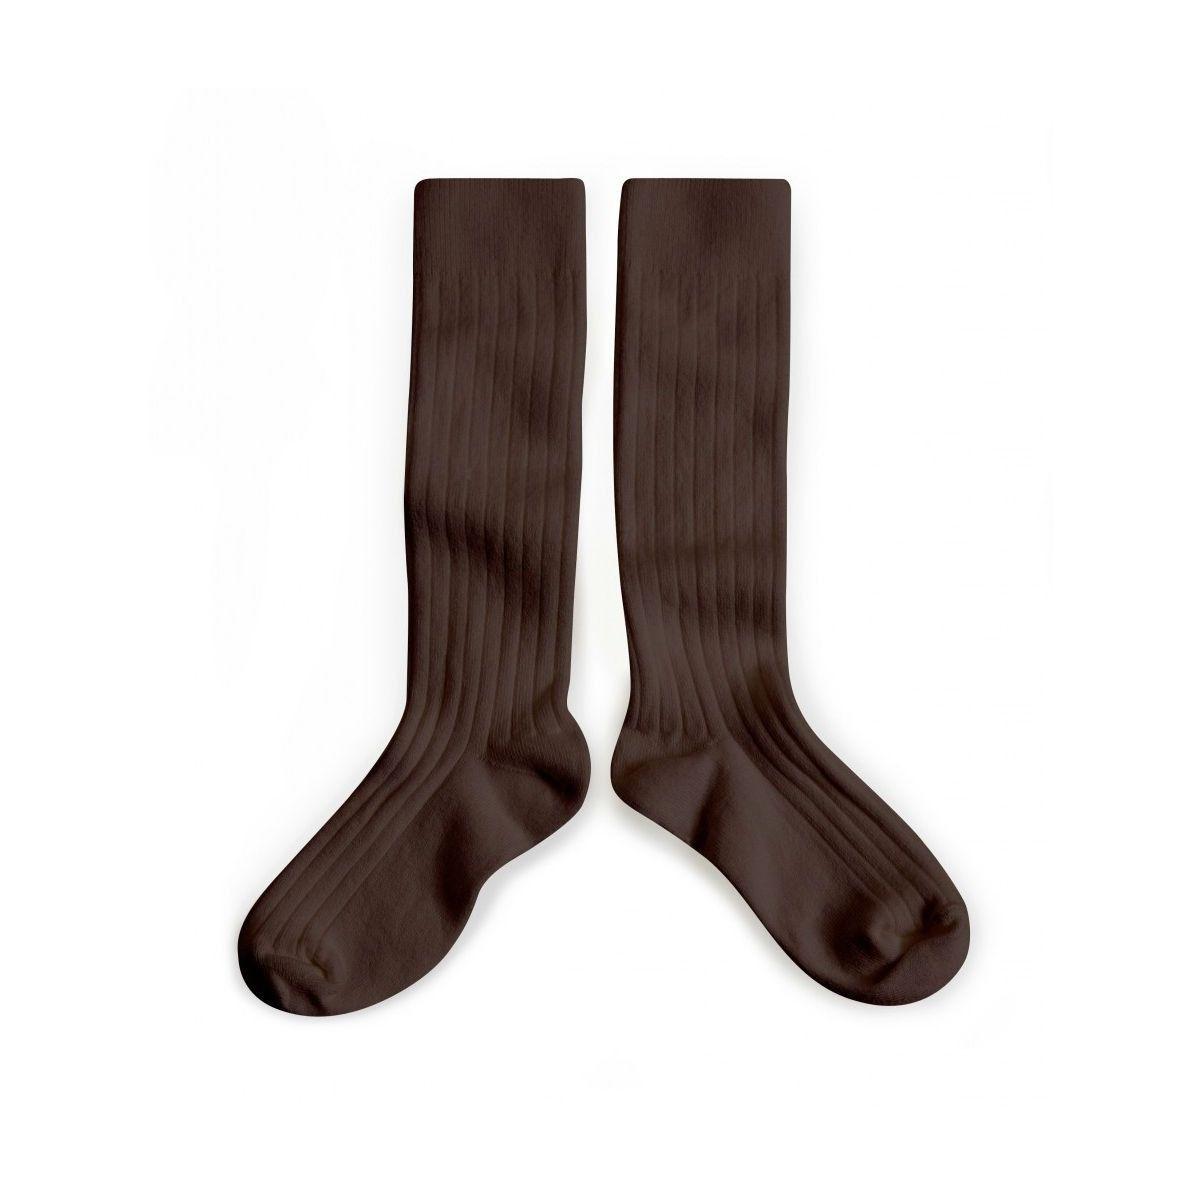 Collégien Podkolanówki Kneesocks Cafe Noir dark brown ciemny